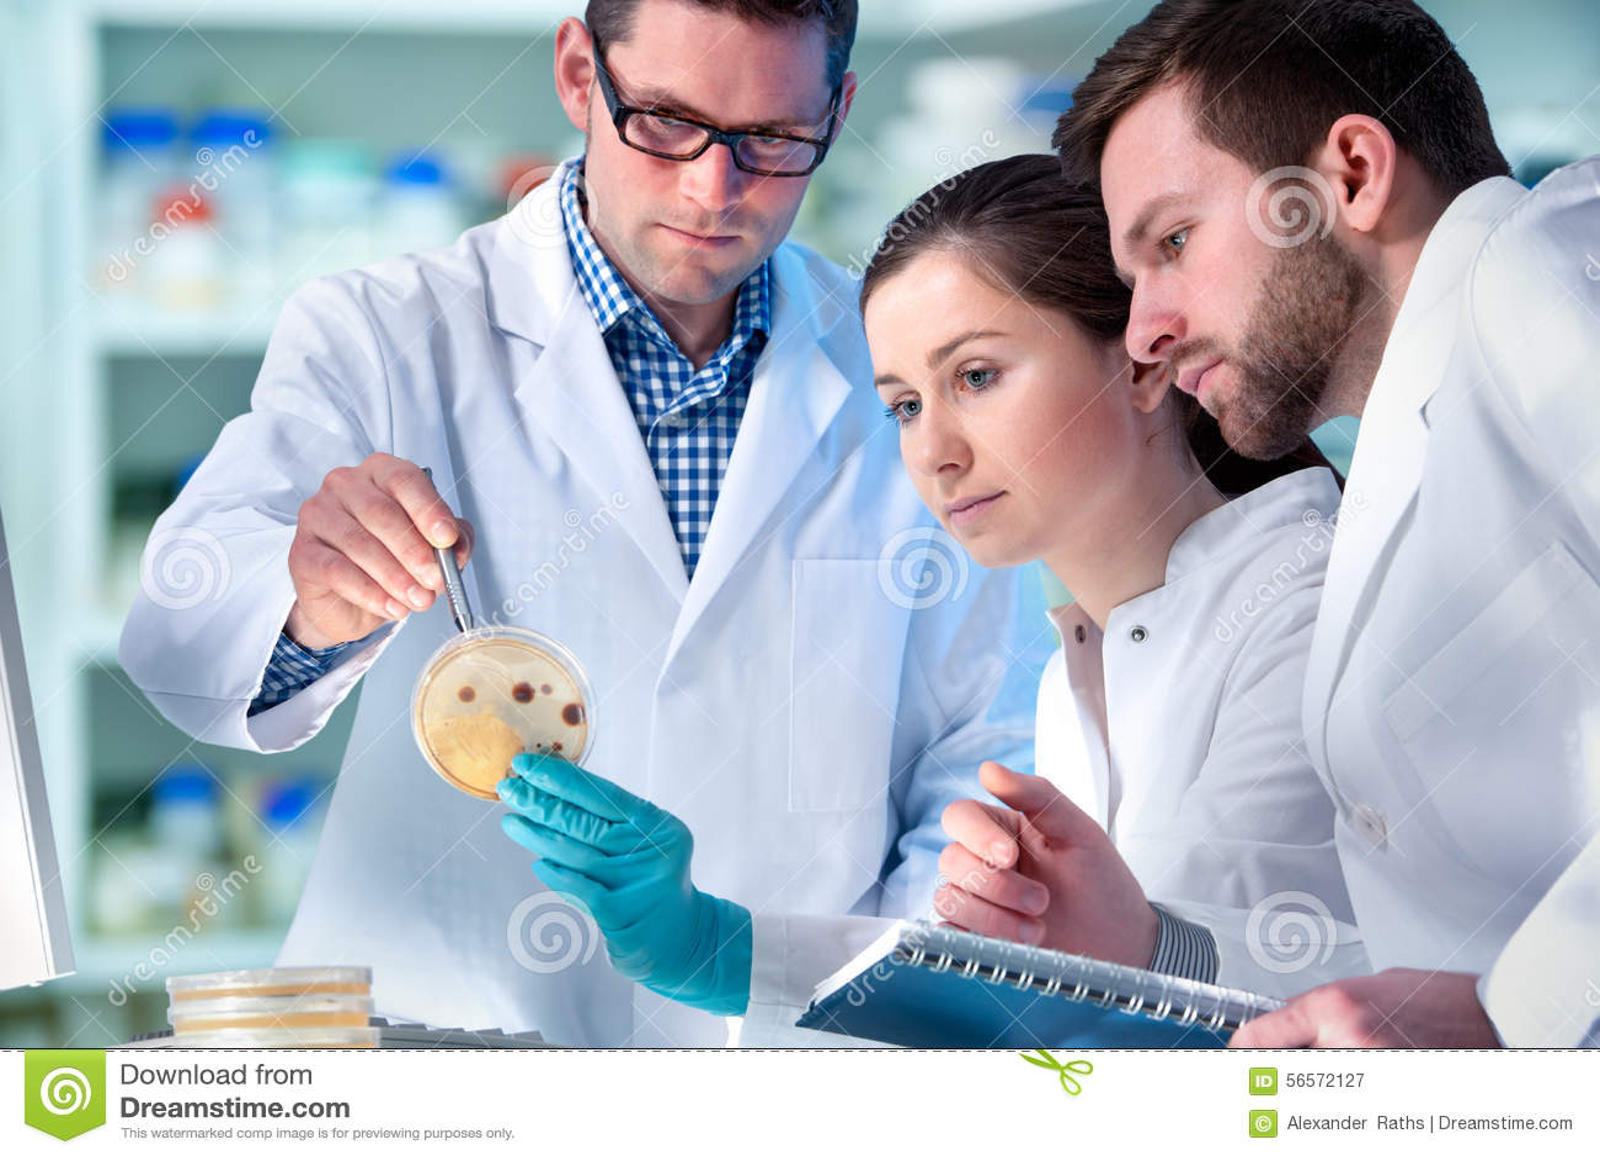 Download Επιστήμονες που εργάζονται στο εργαστήριο Στοκ Εικόνα - εικόνα από εγγράφων, χημικός: 56572127